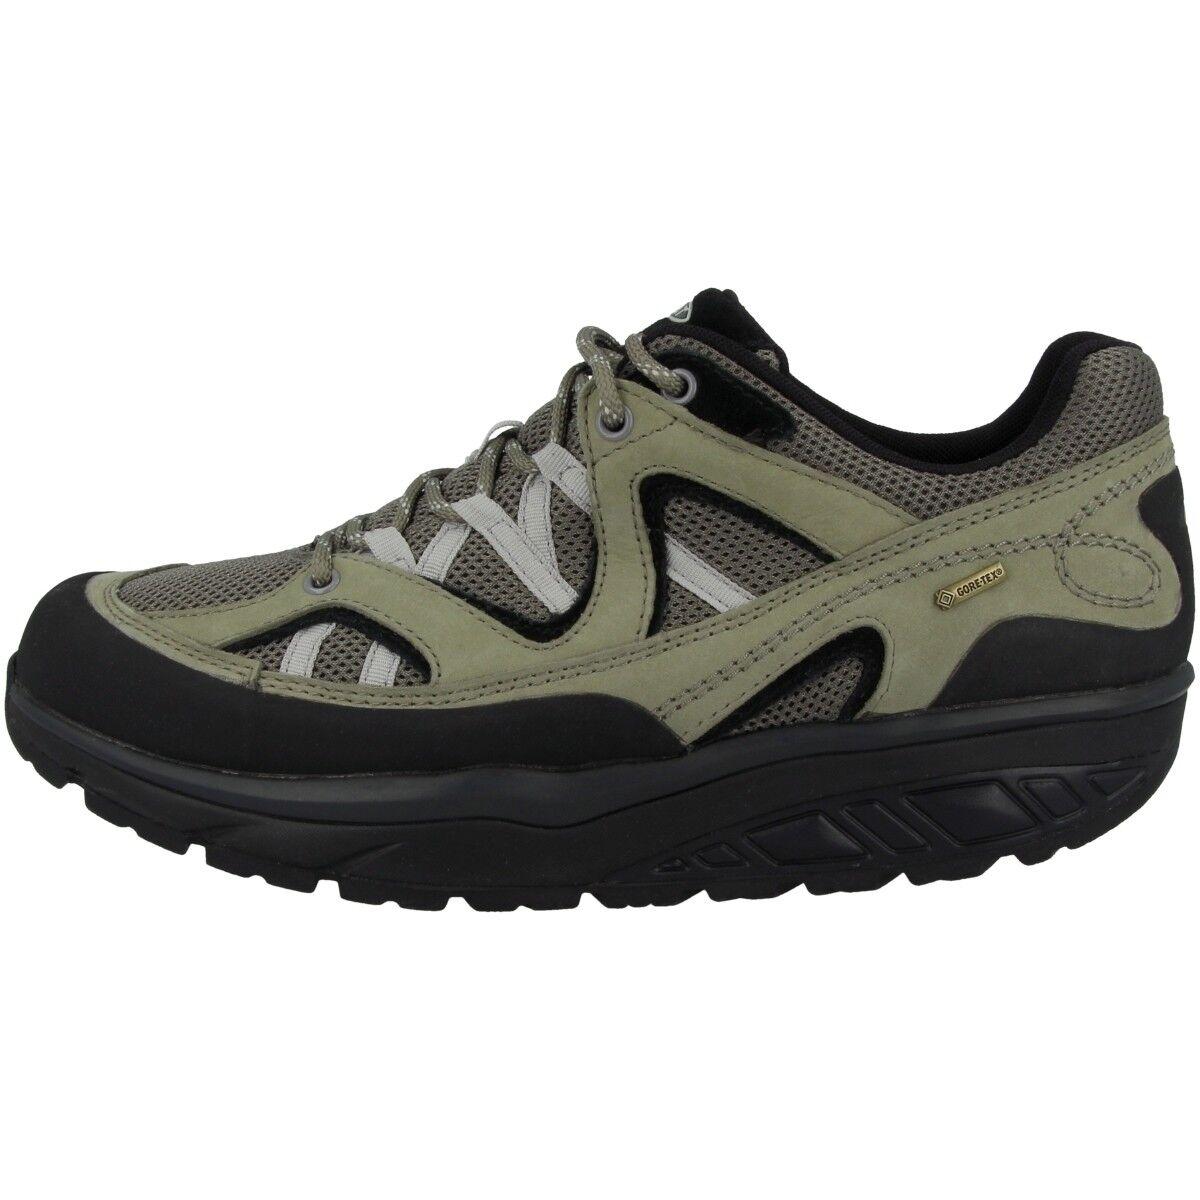 MBT MBT MBT himaya GTX femmes Chaussures Femmes Gore-Tex Fitness Santé Chaussures 700718-245 T 898789